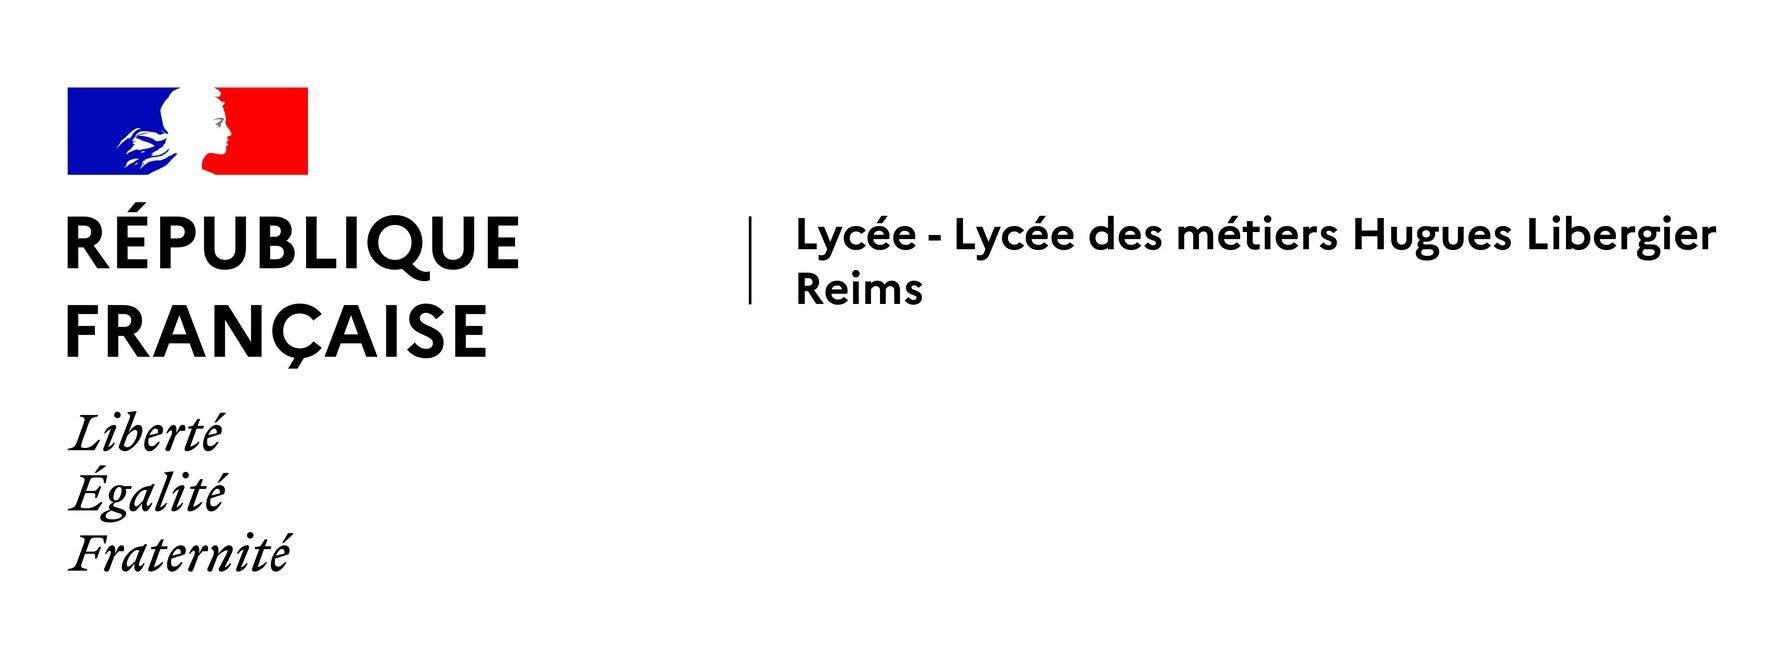 51_Lycee Lycee des metiers Hugues Libergier_Reims_courrier.jpg